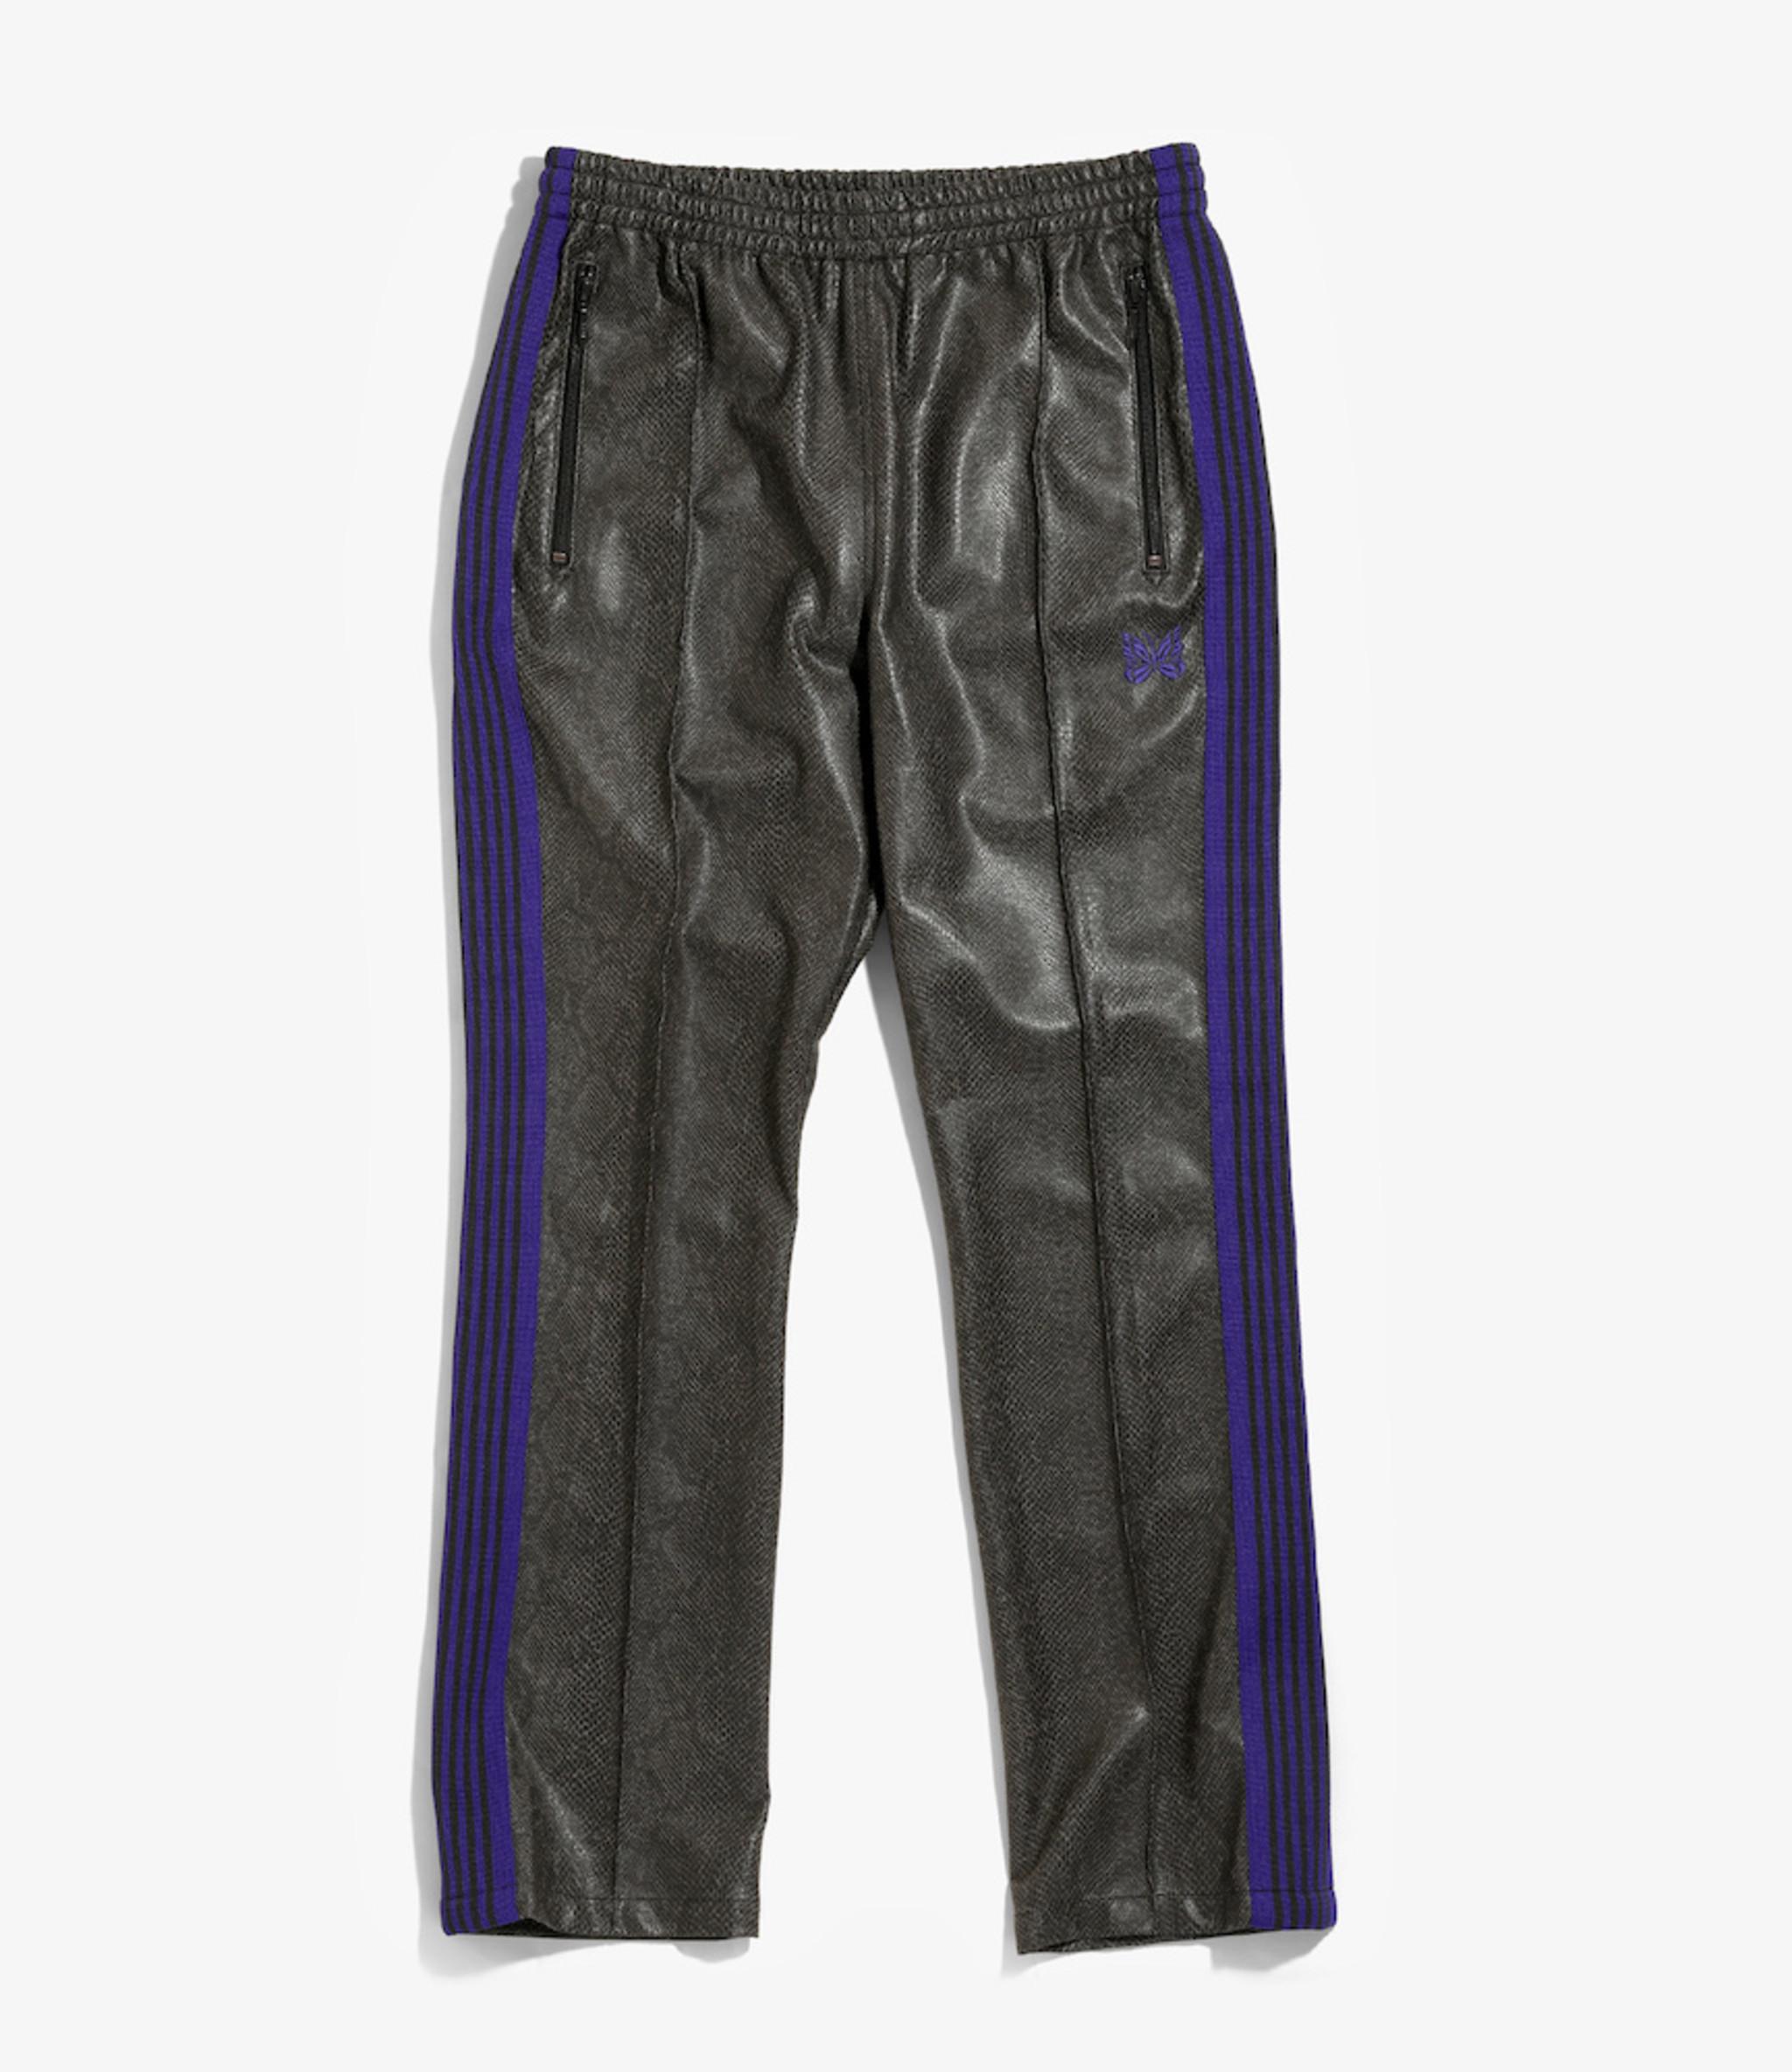 Needles Narrow Track Pant - Synthetic Leather / Python - Grey